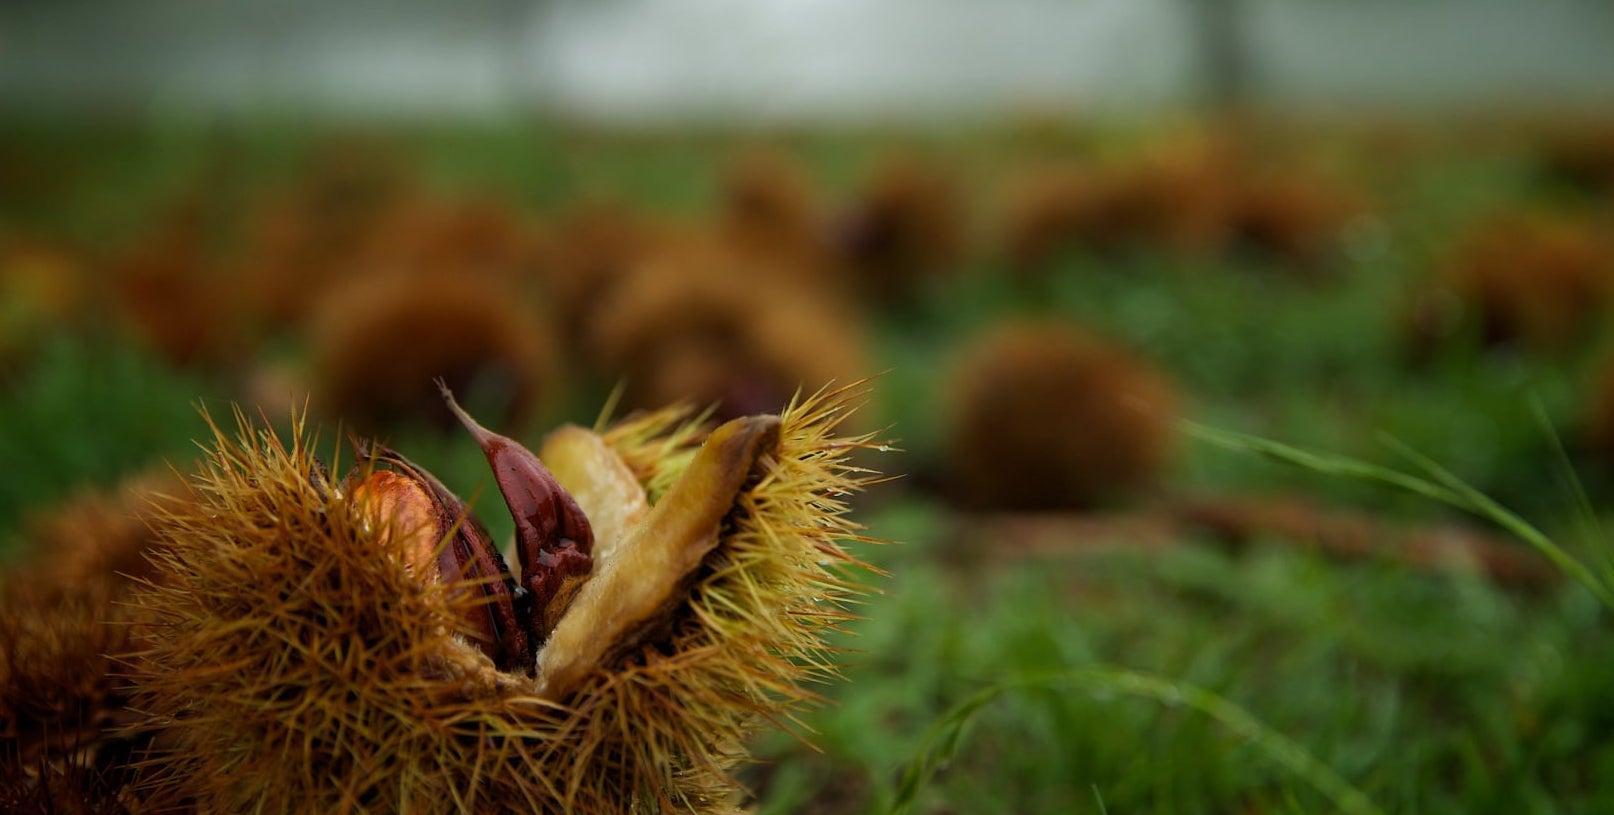 Nutwood Farm - Chestnuts and Walnuts